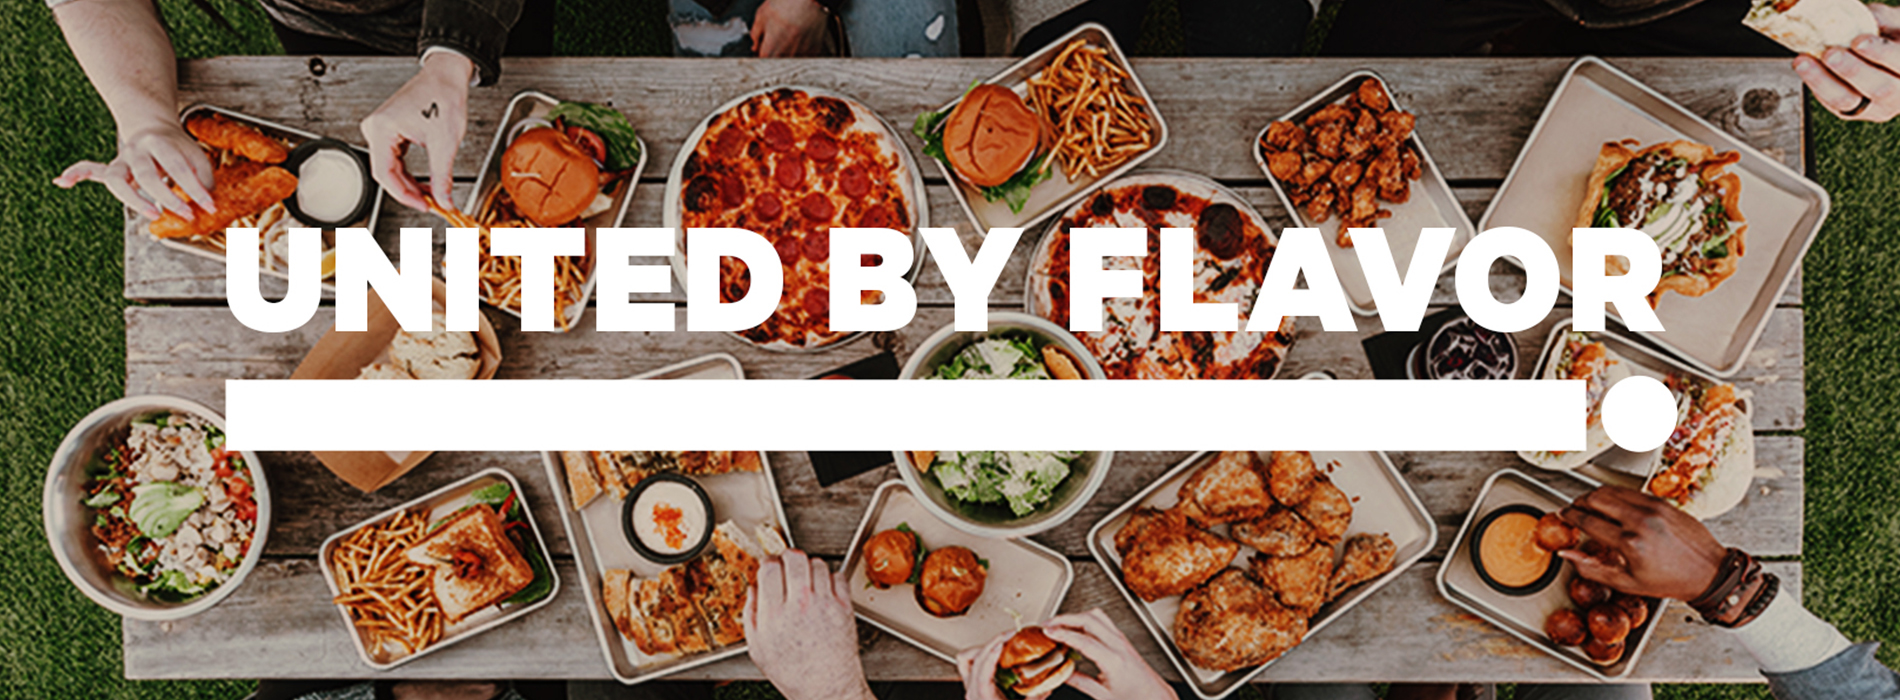 Markenagentur Werbeagentur Düsseldorf Food Catering Street Food United